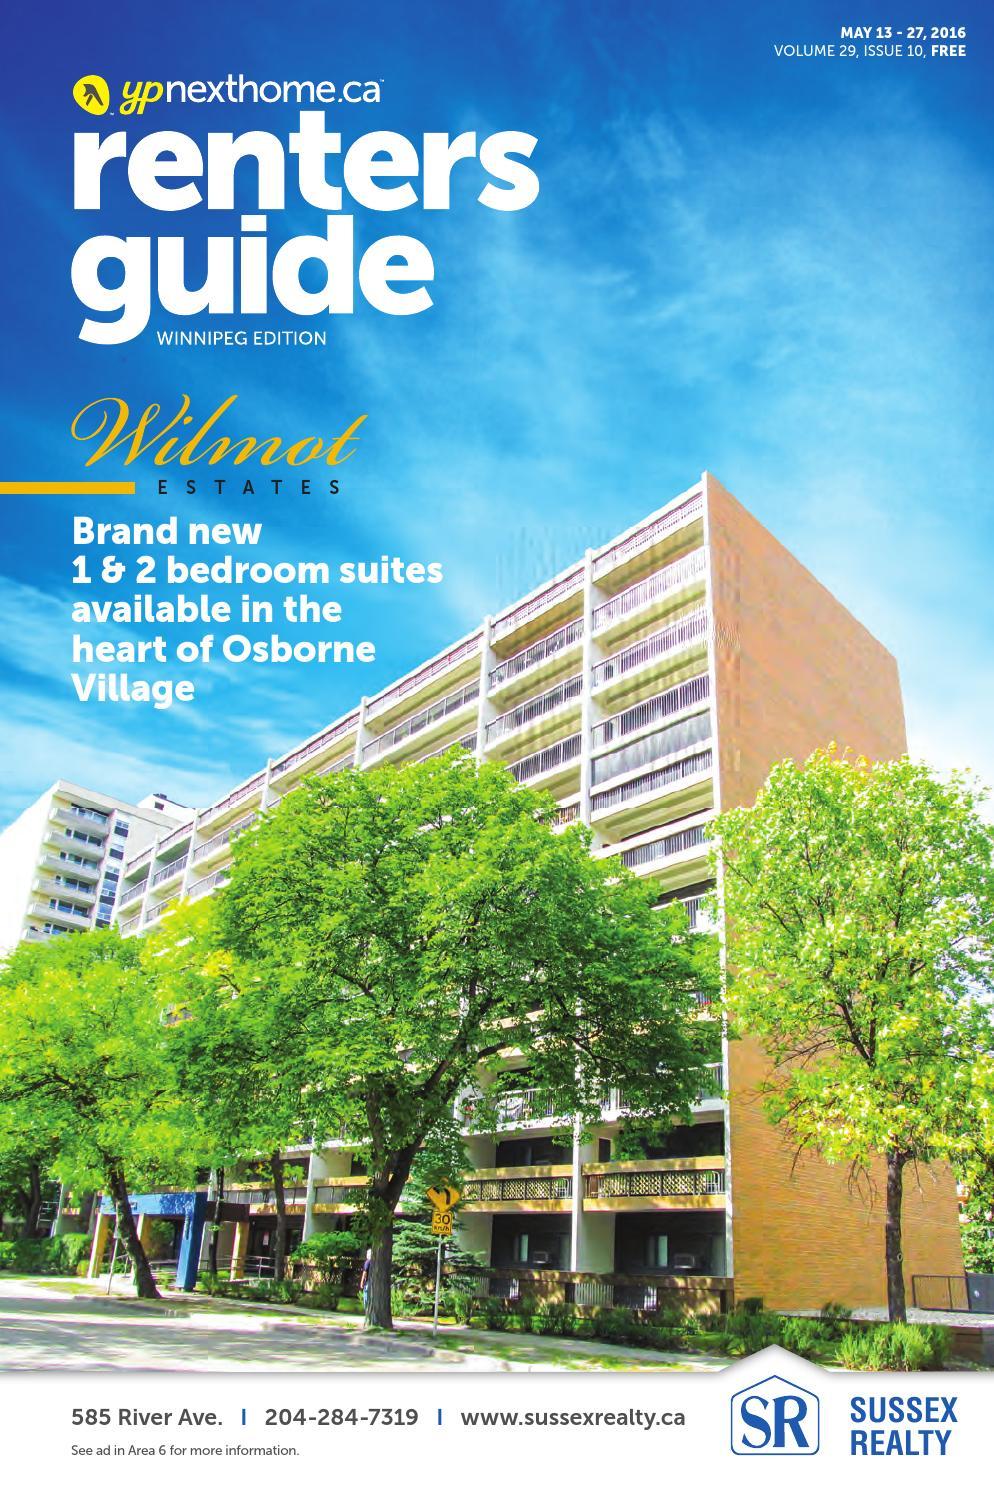 WINNIPEG Renters Guide - 13 May, 2016 by NextHome - issuu